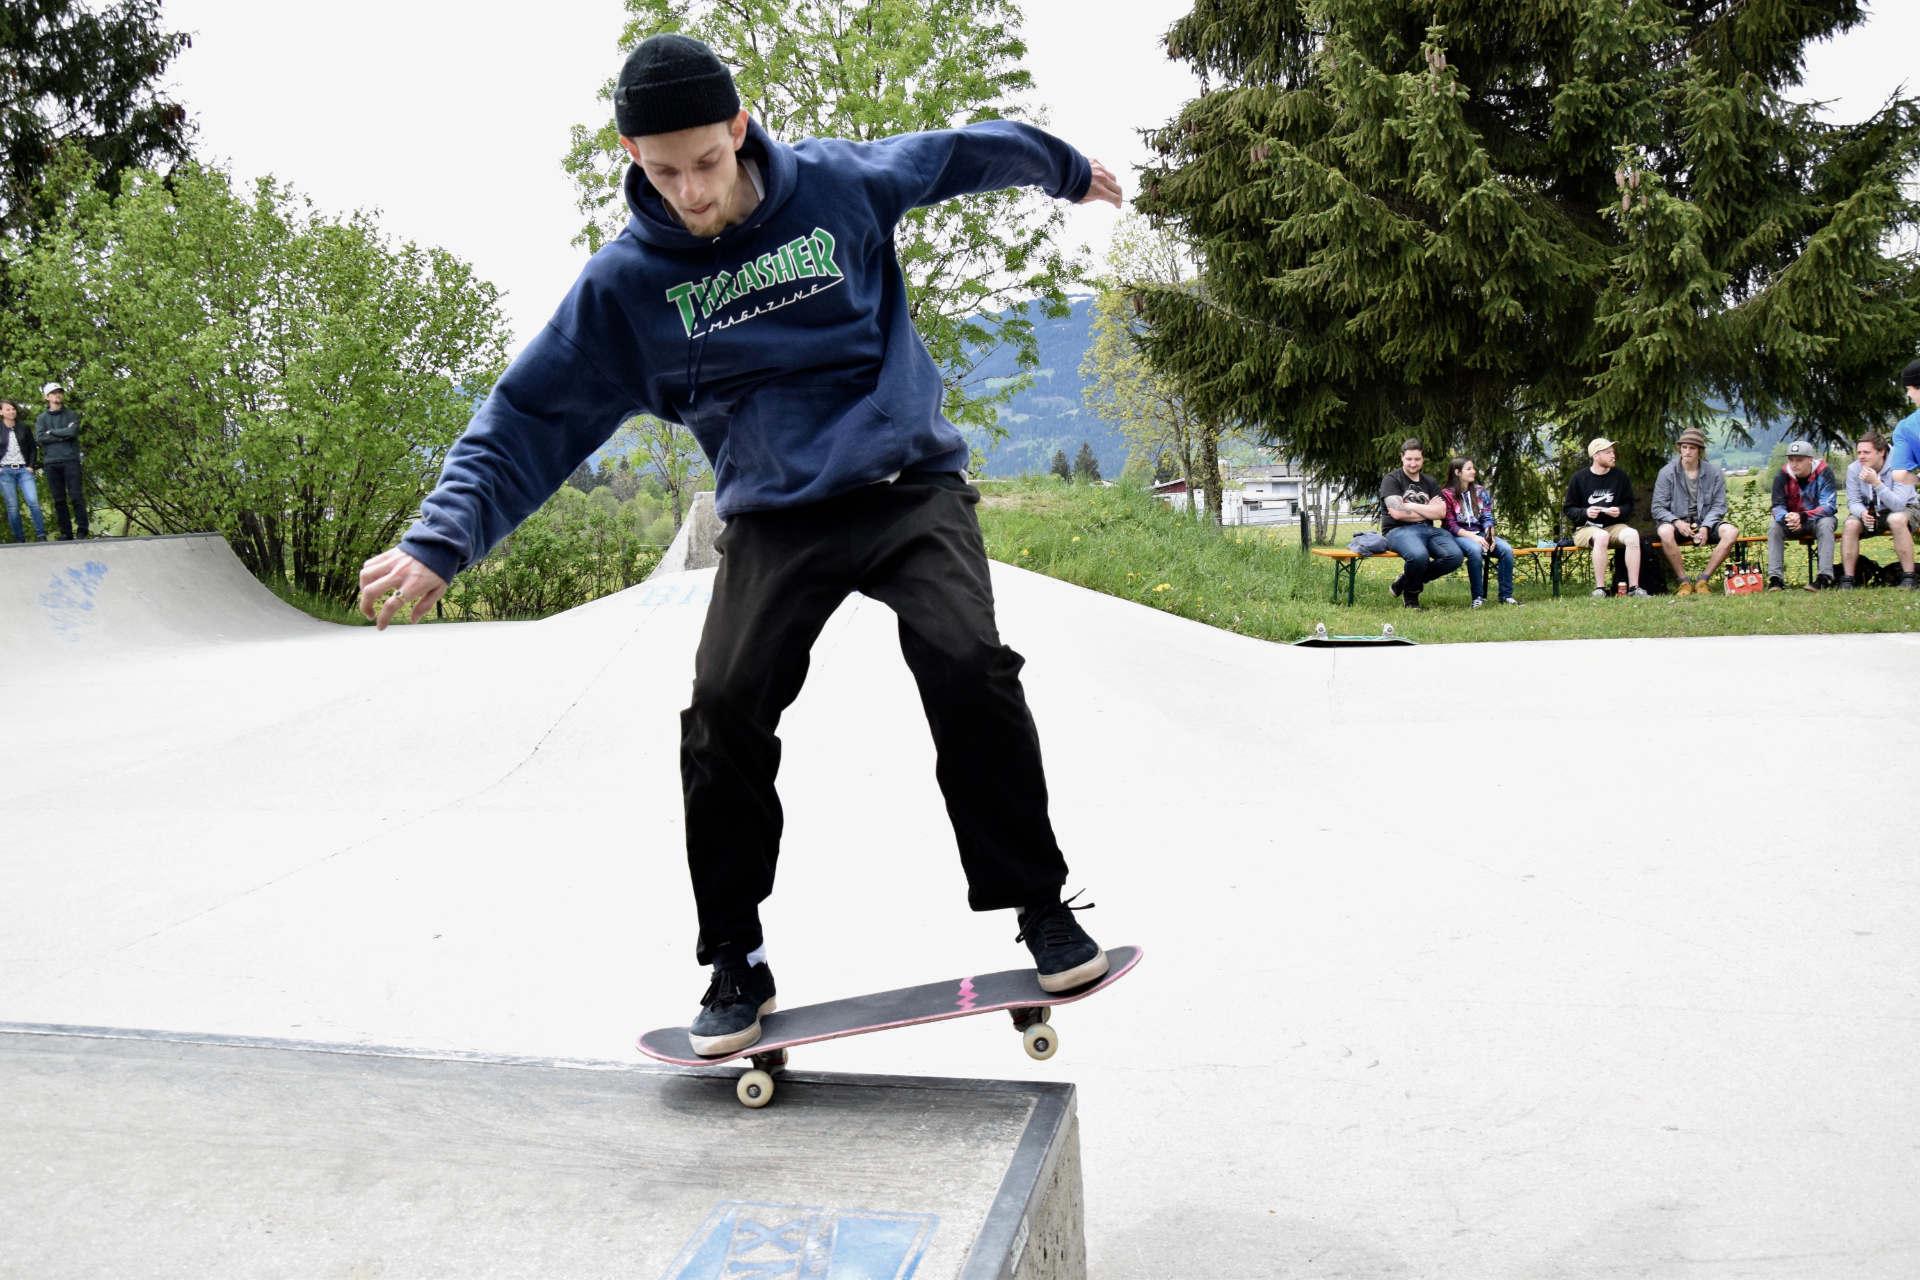 skateboard headz fieberbrunn kgt kitz gau trophy 2019 saalfelden00004